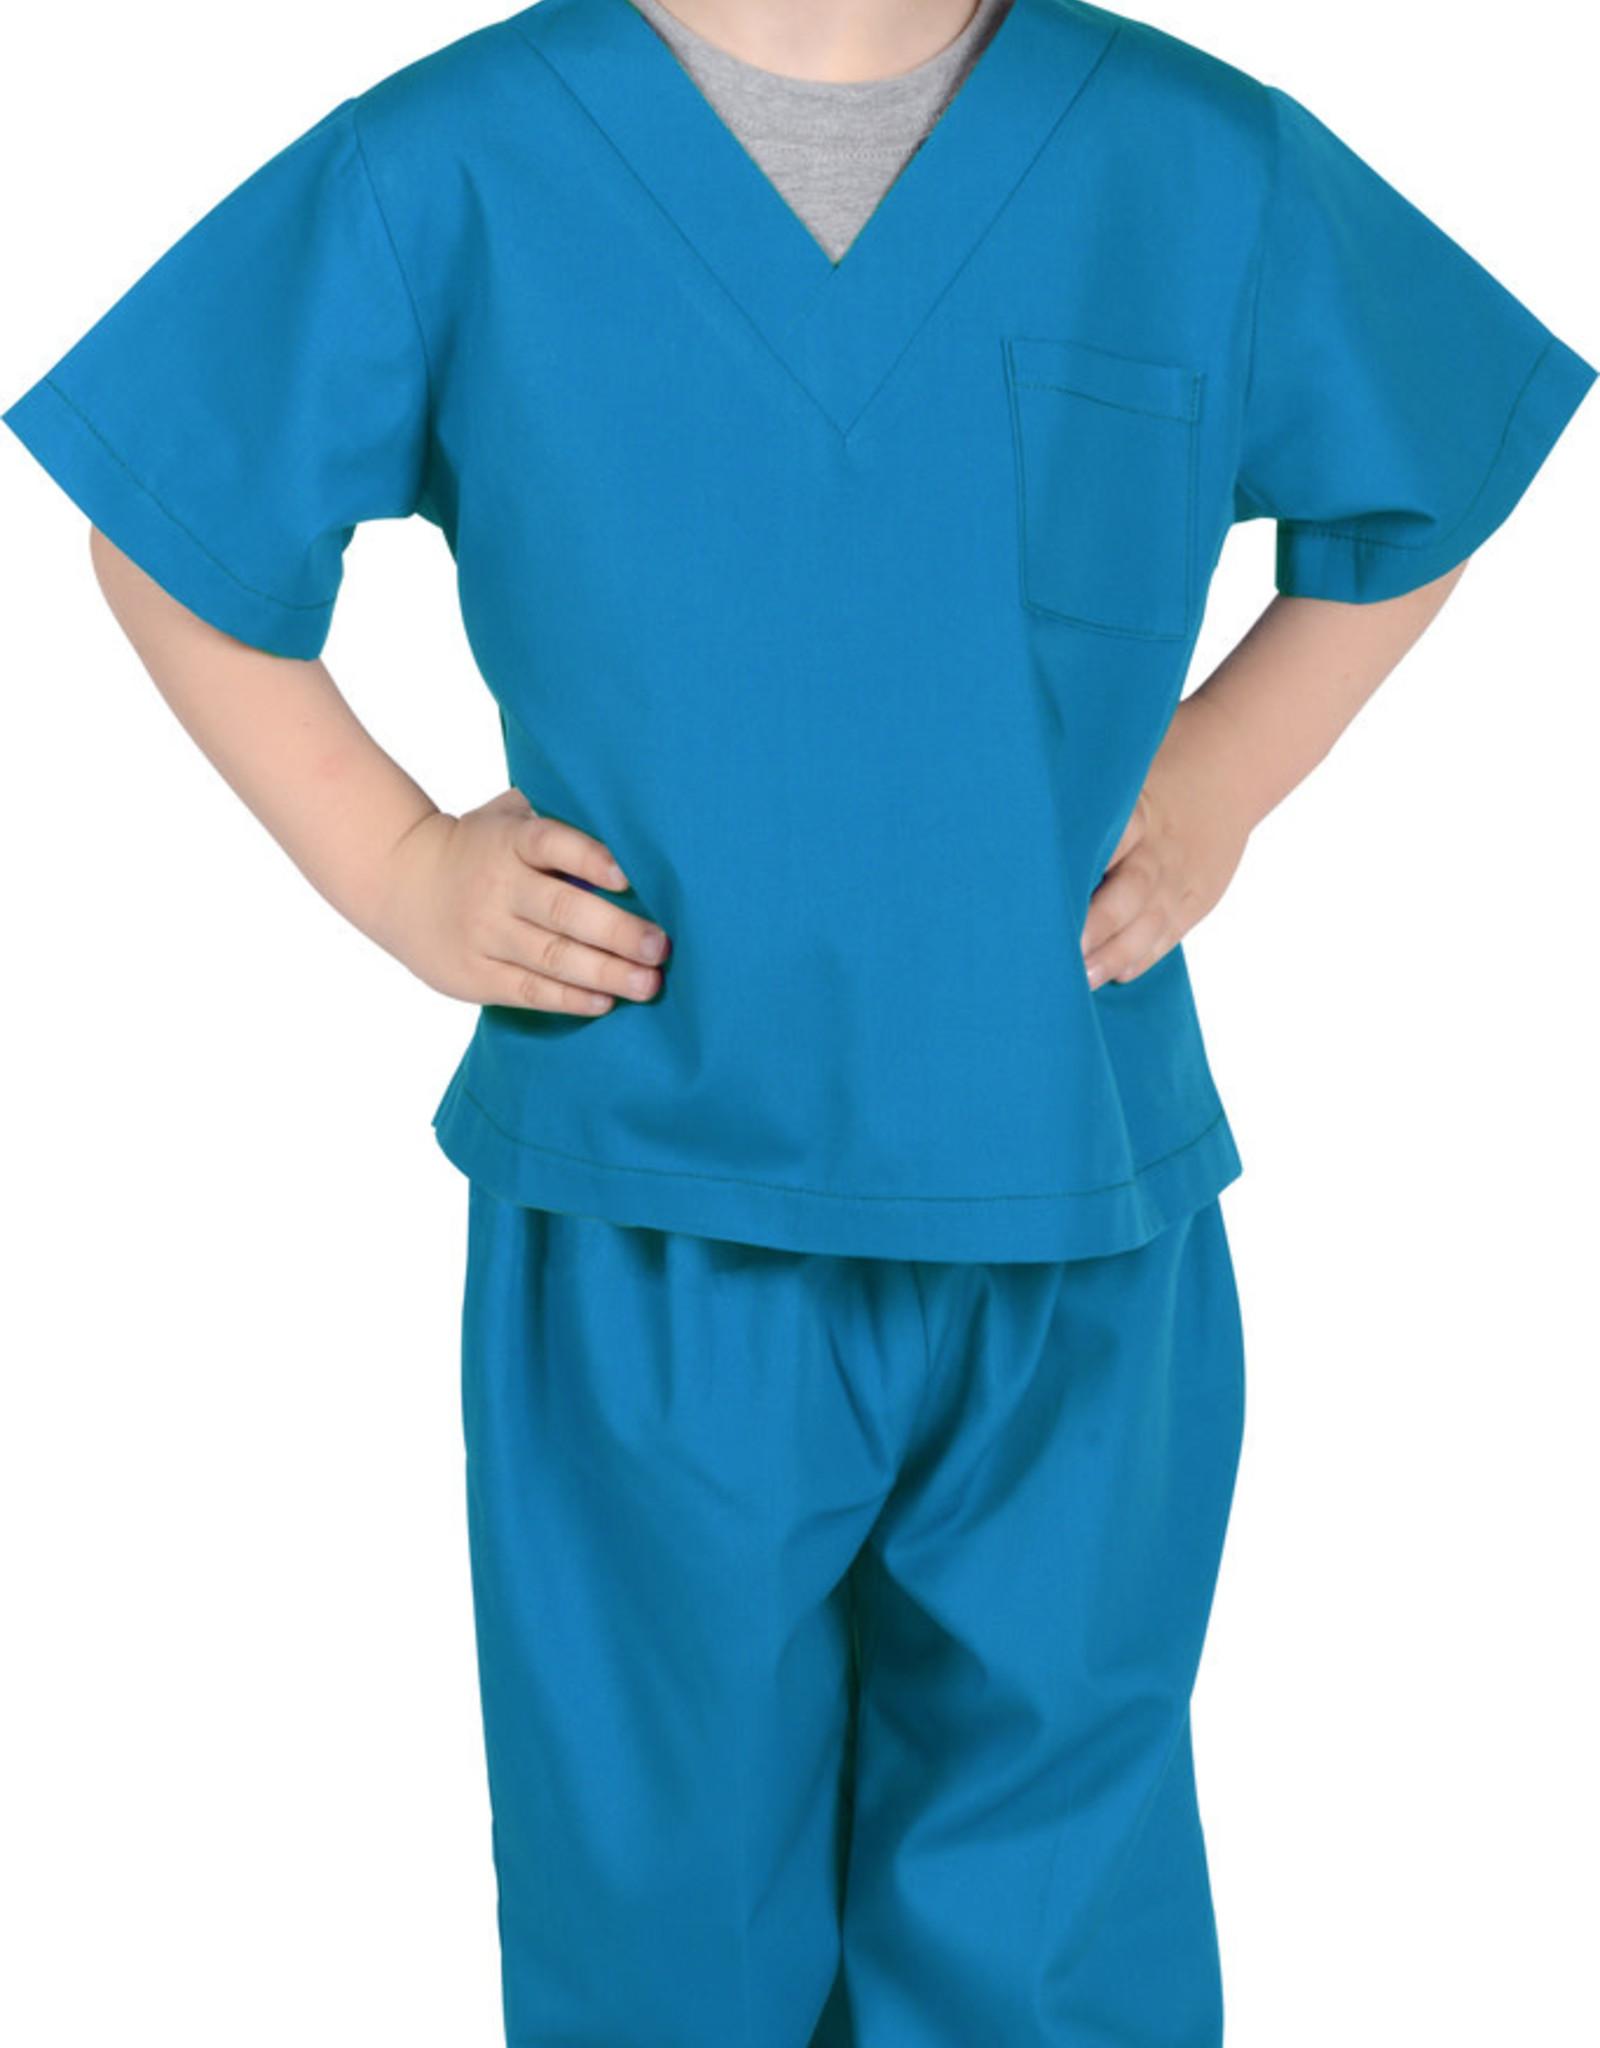 Aeromax Jr. Doctor Scrubs, Astor Blue, size 6/8